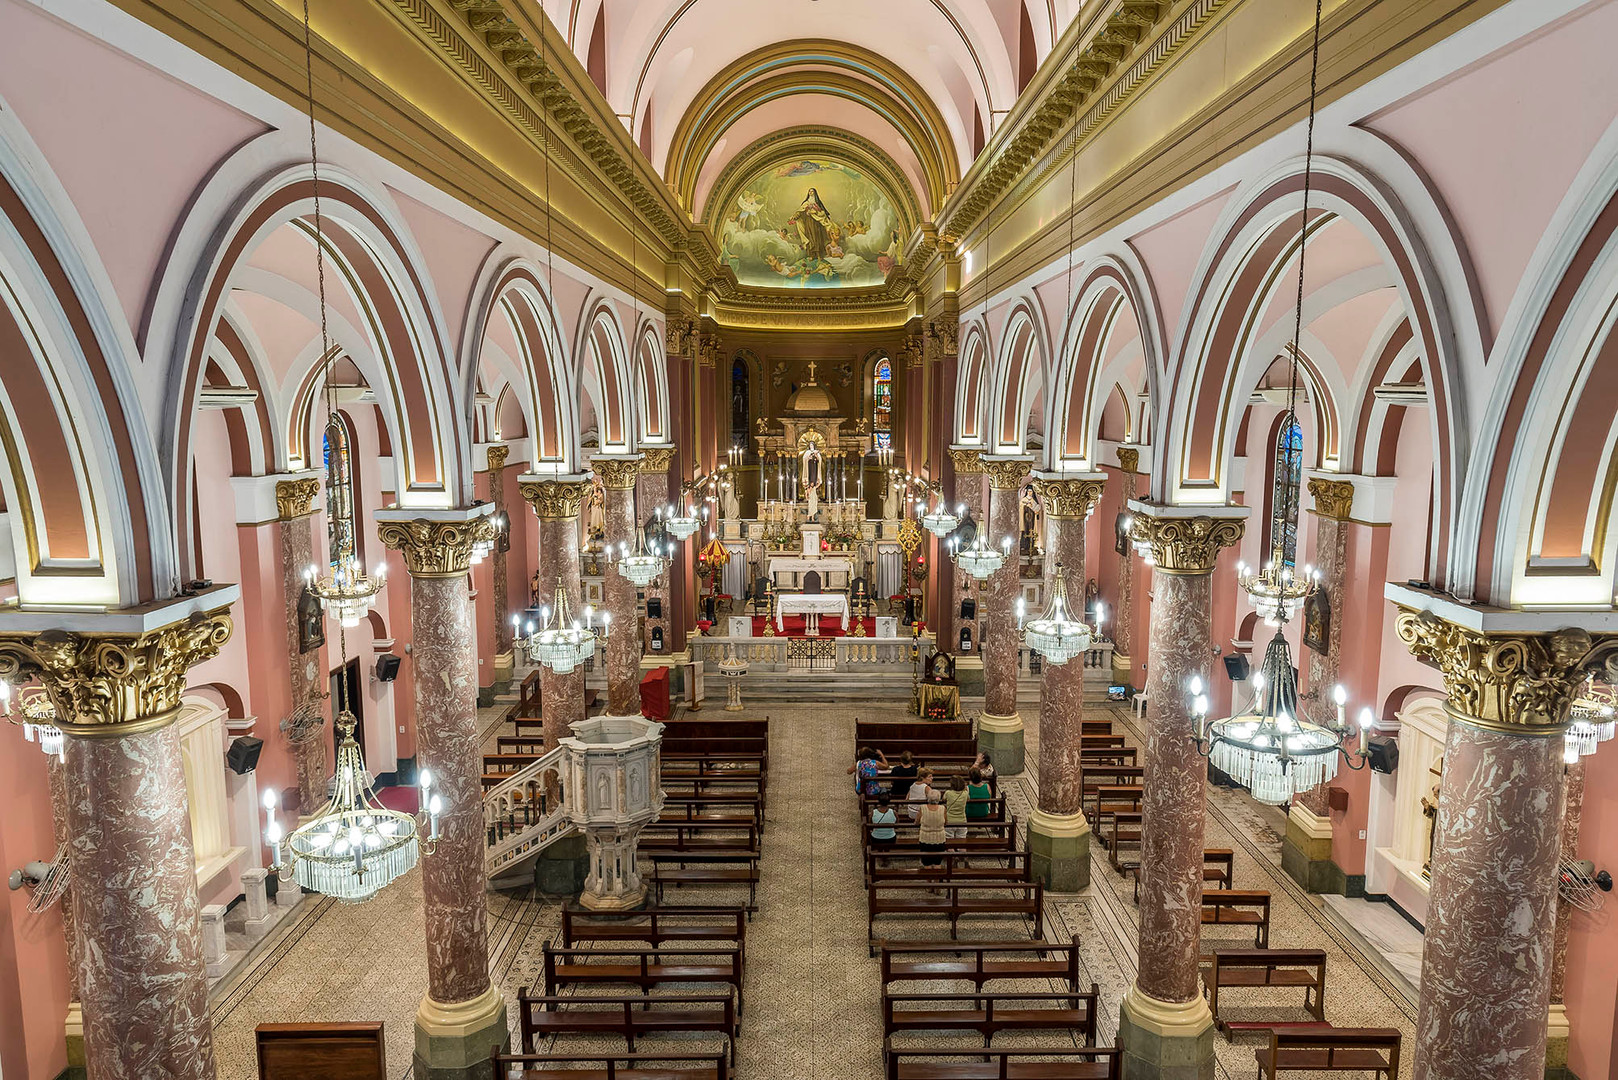 Basilica_STMJ-Rio-33-MDLight-Abril2016.j